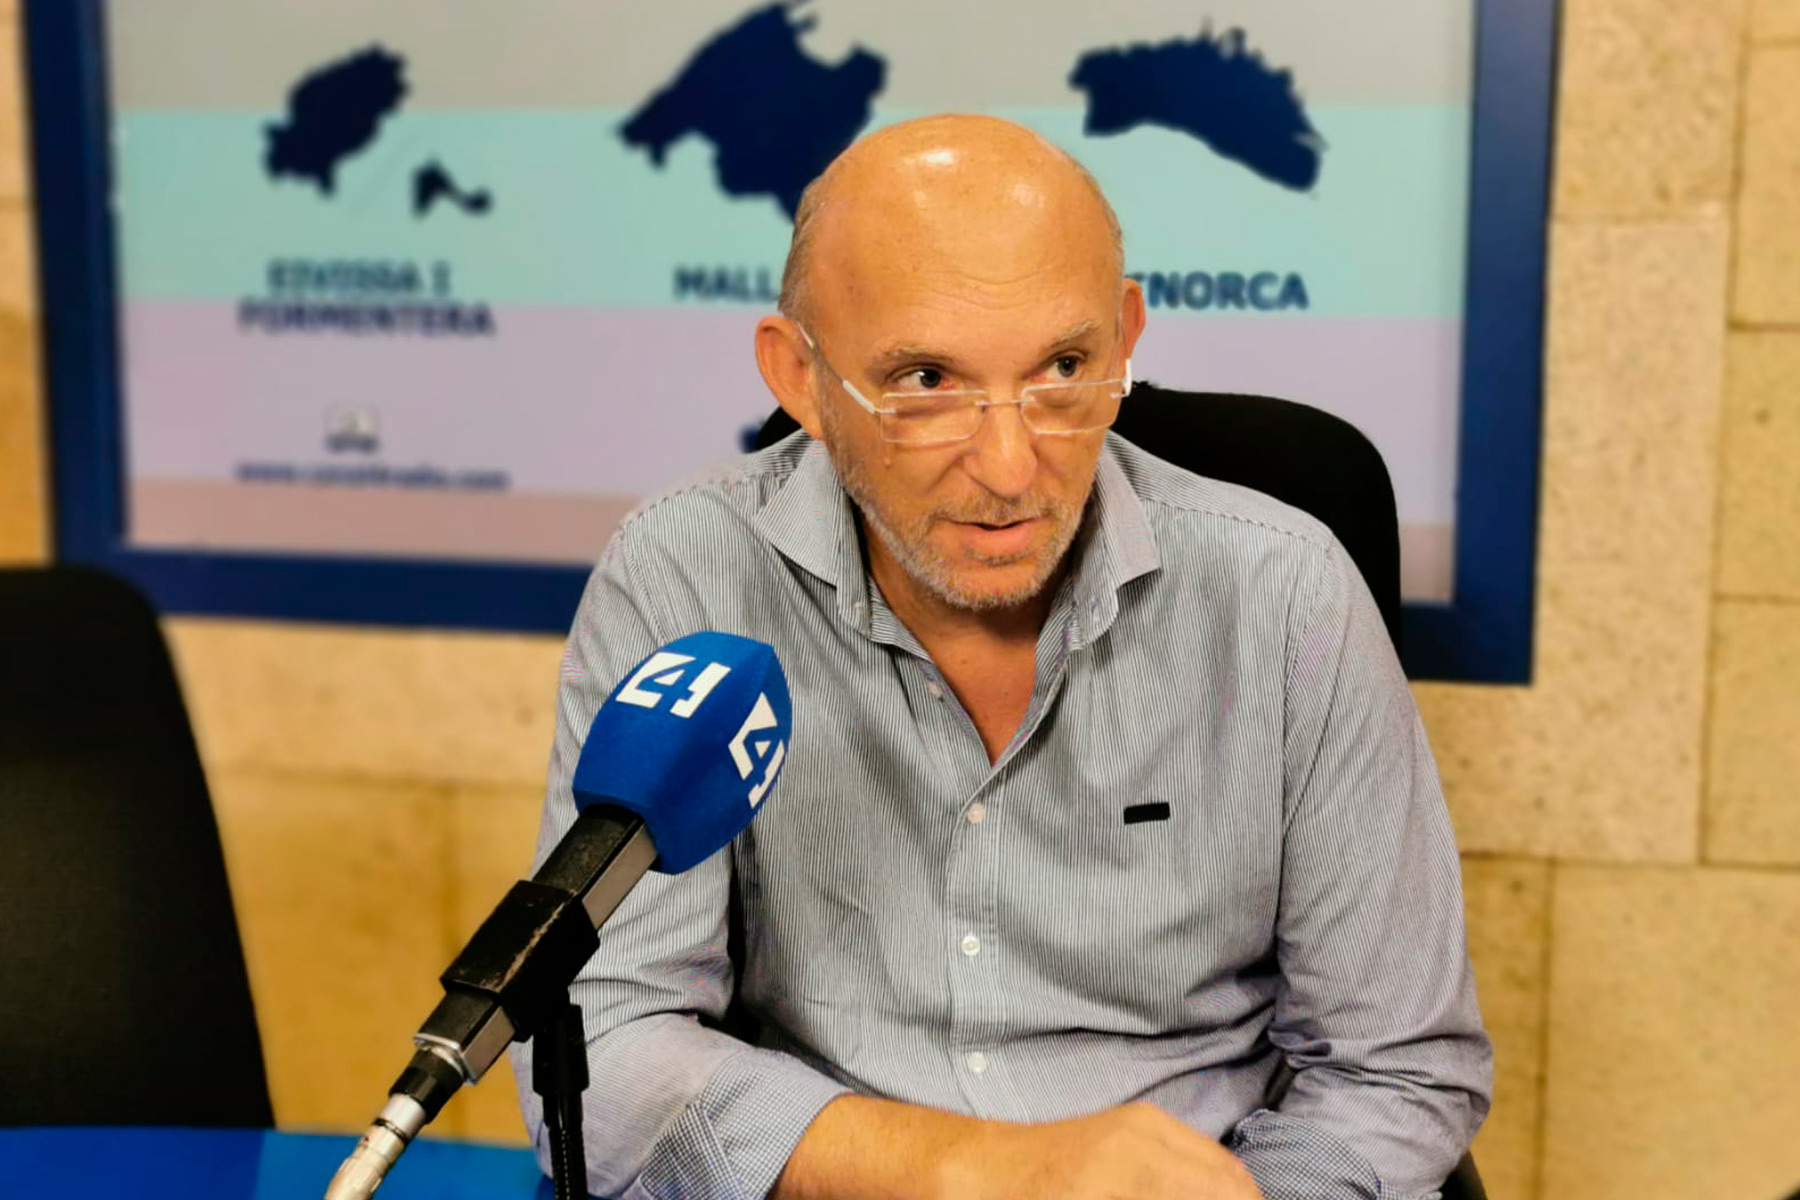 Bernat Bonnín talks about the agreement with KPMG on Radio